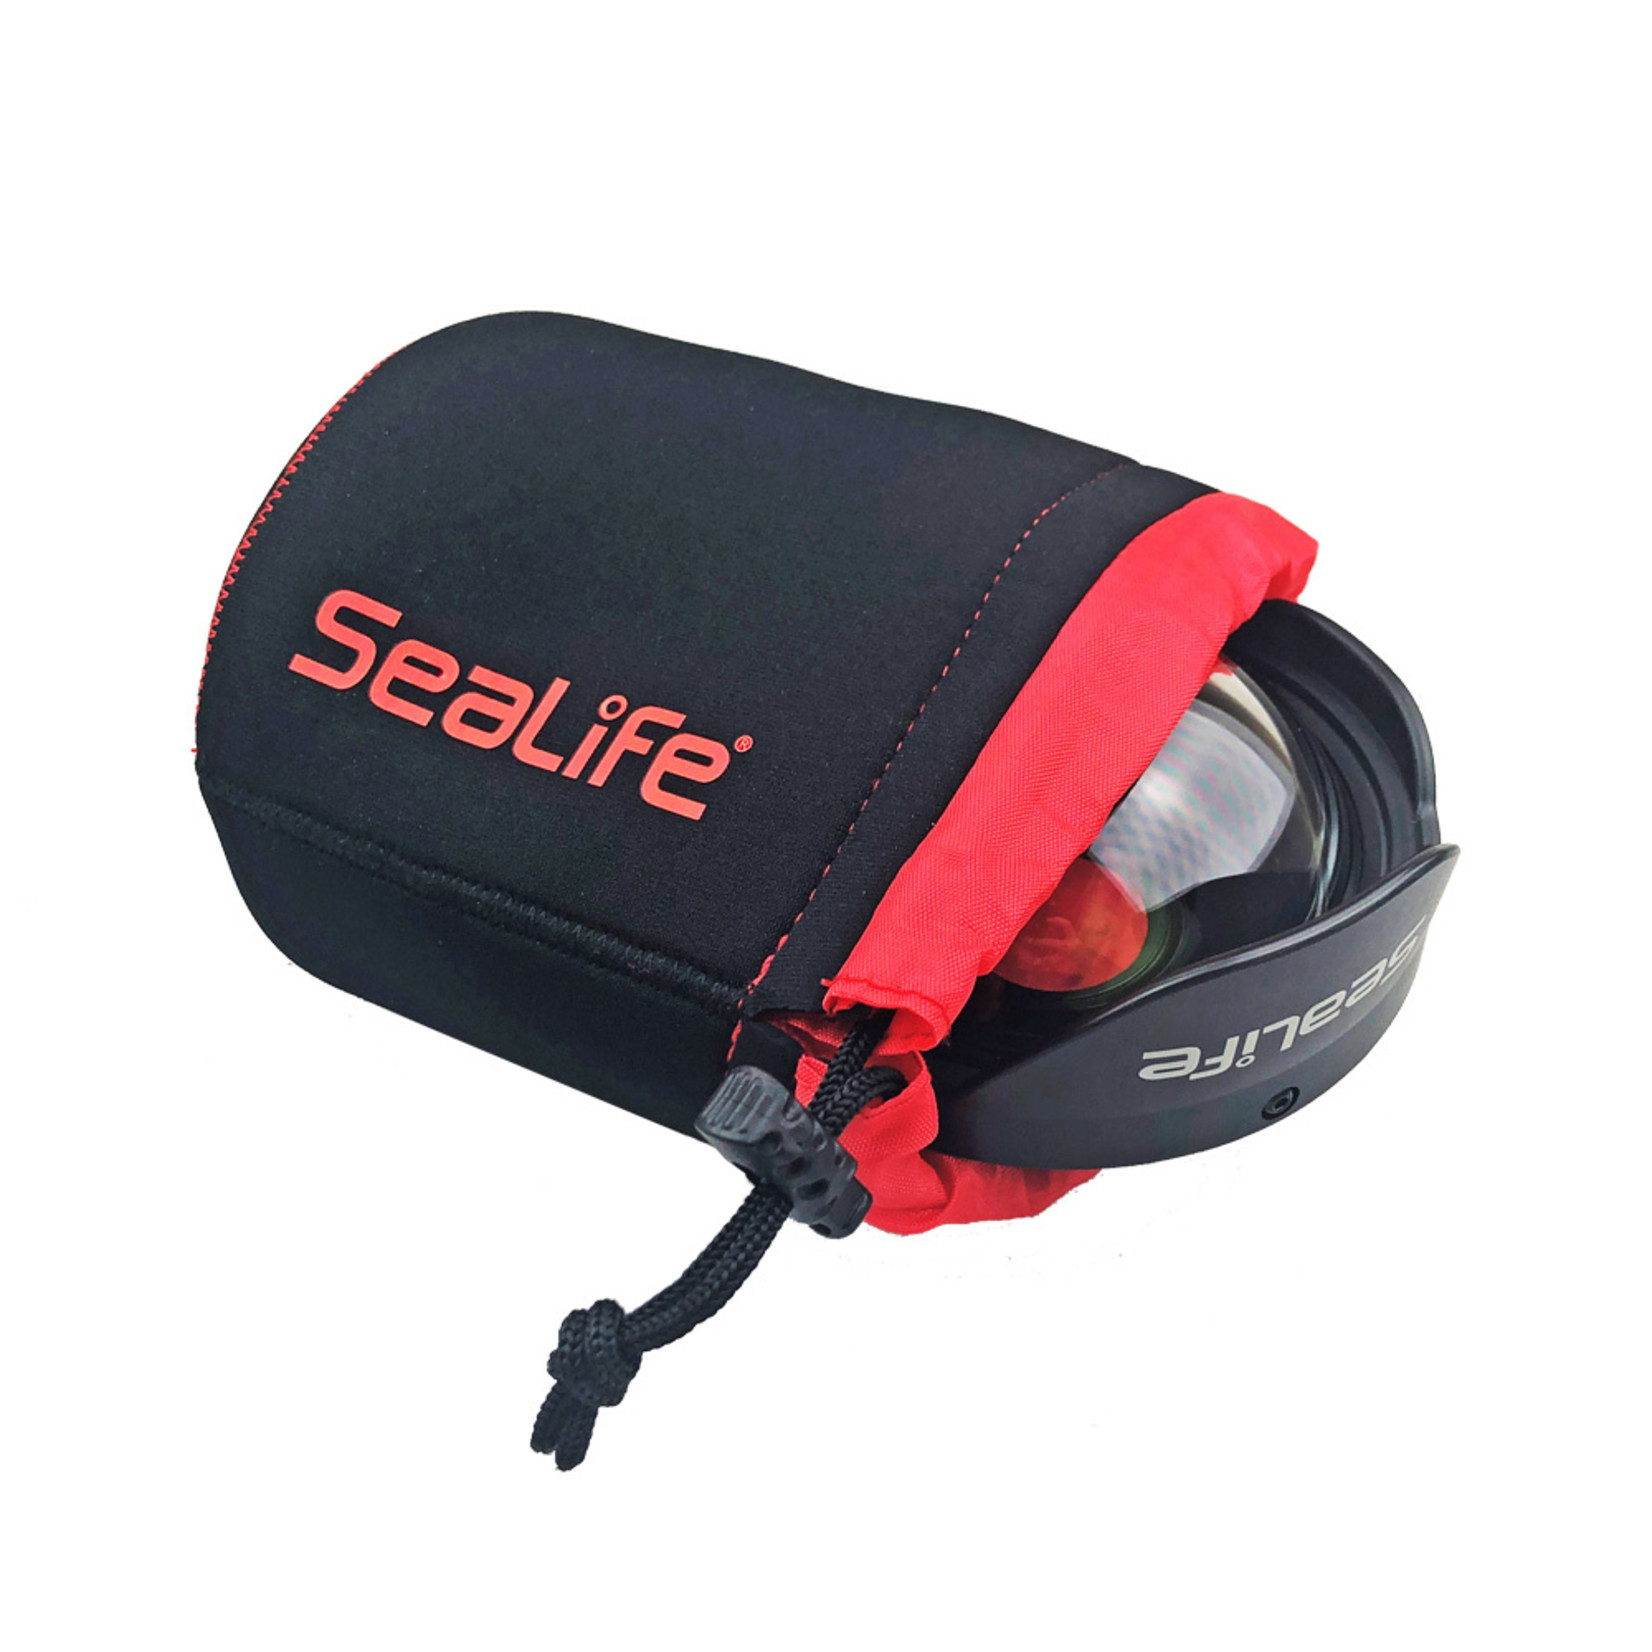 Sealife Protective Neoprene Gear Pouch for Camera's Lenses & Optics